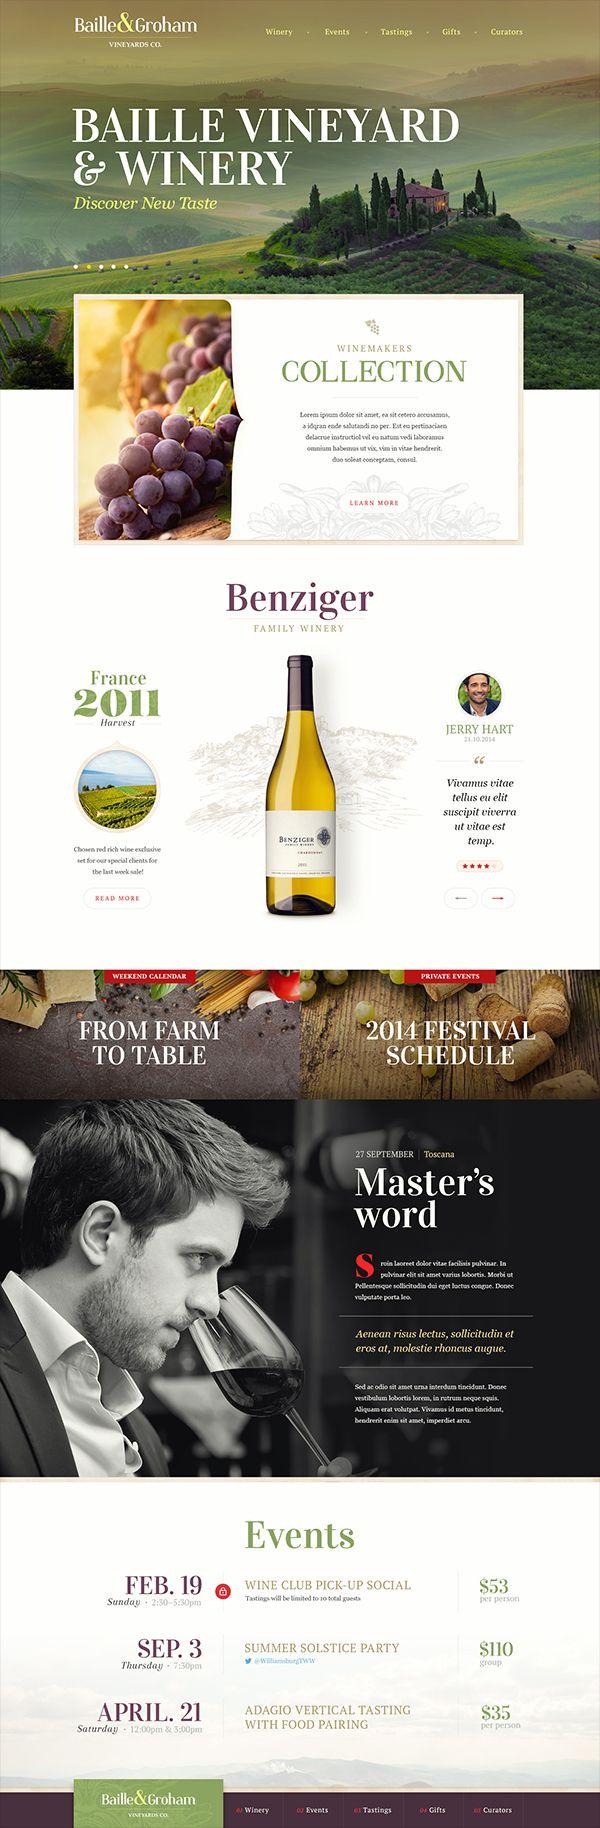 Website design: part 2 on Behance